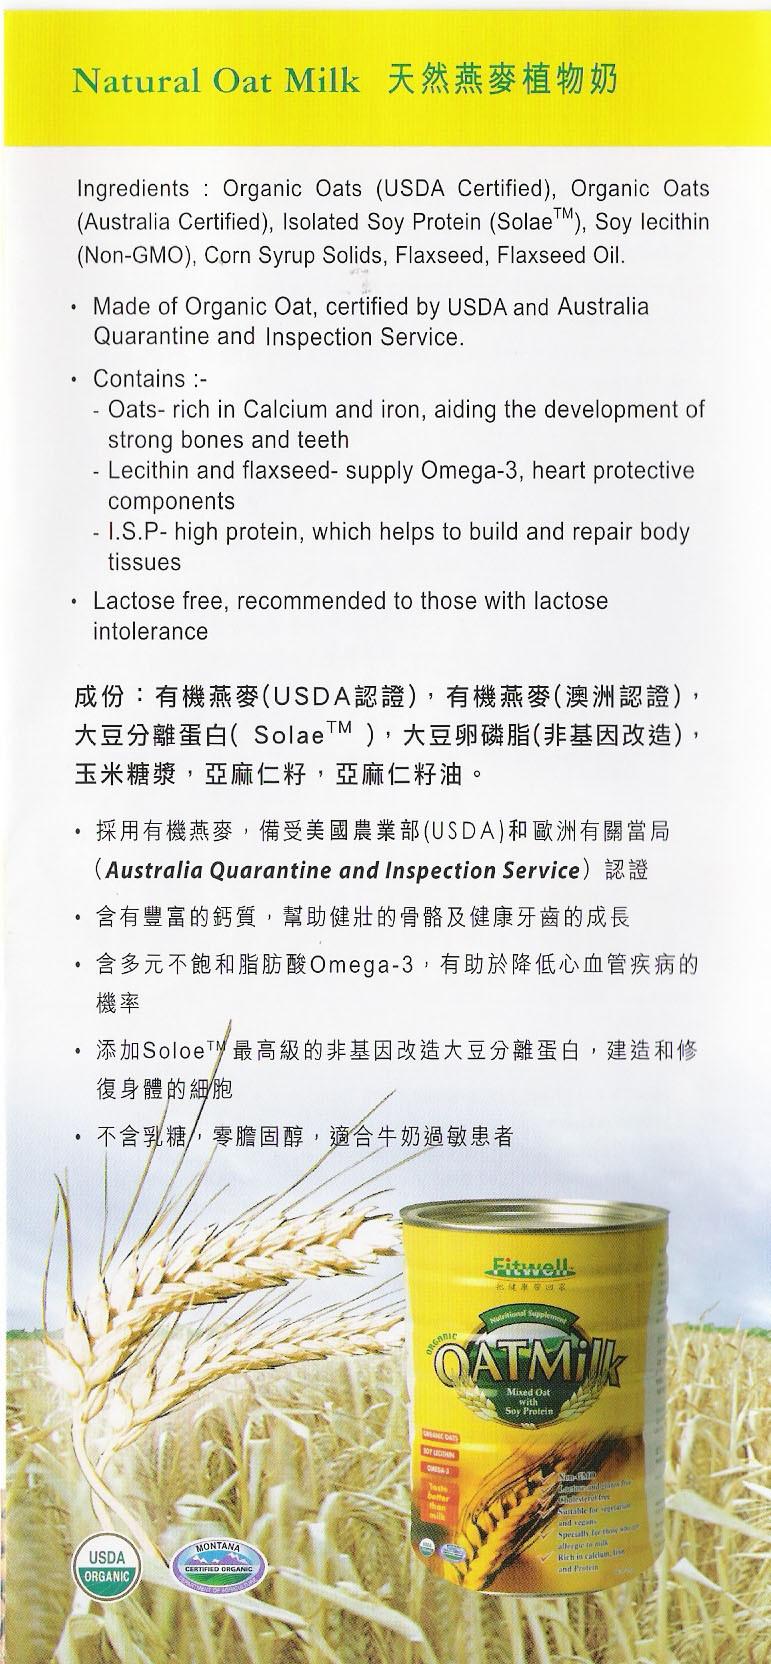 Organic Oats And Soybeans  Organic Oat Milk